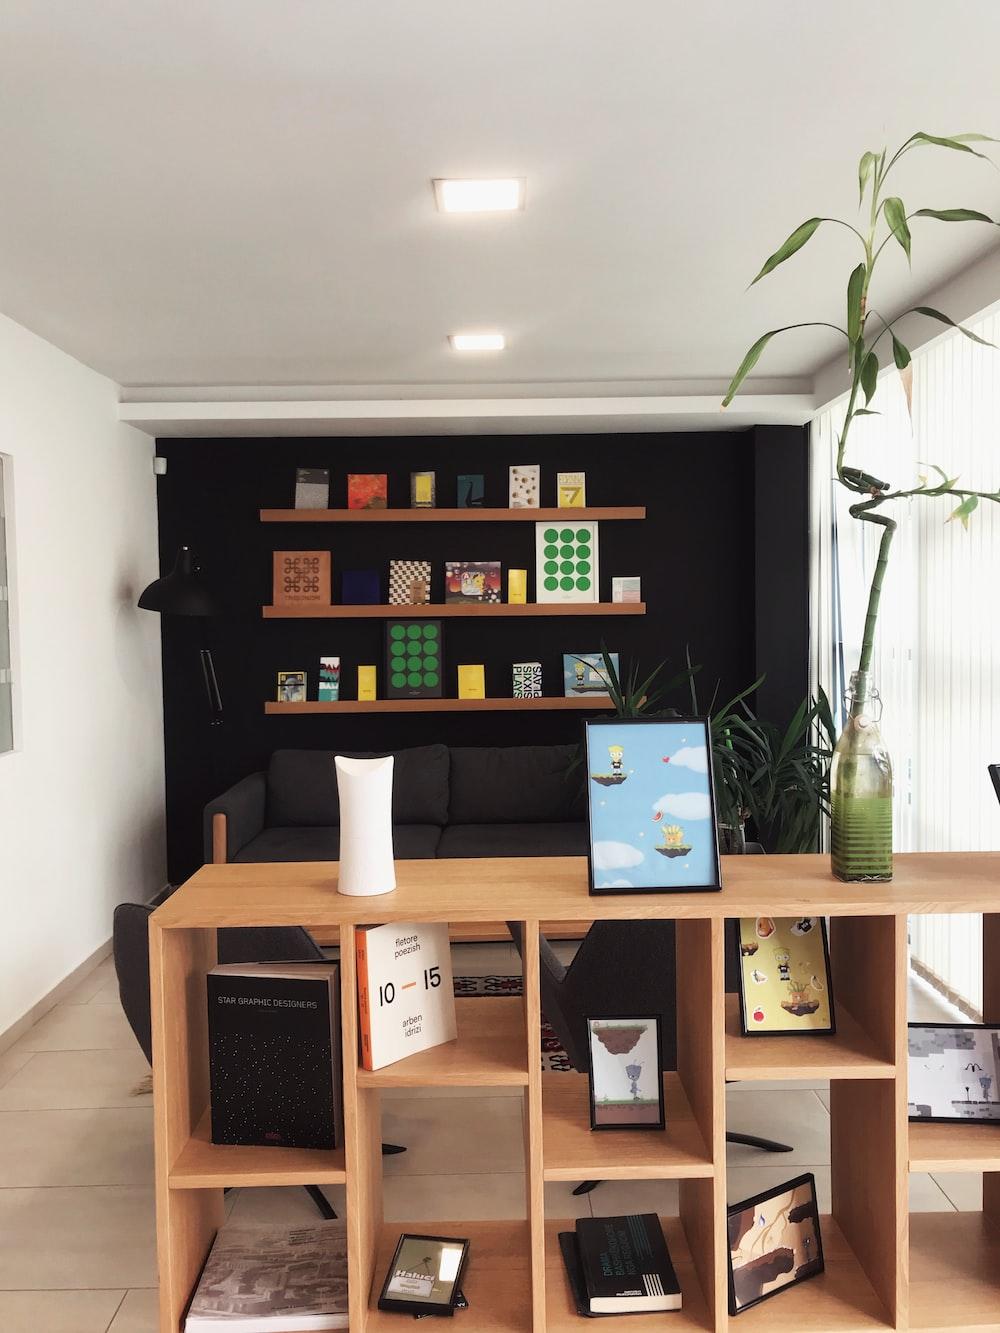 black iPad near lucky bamboo in vase on brown wooden shelf inside room